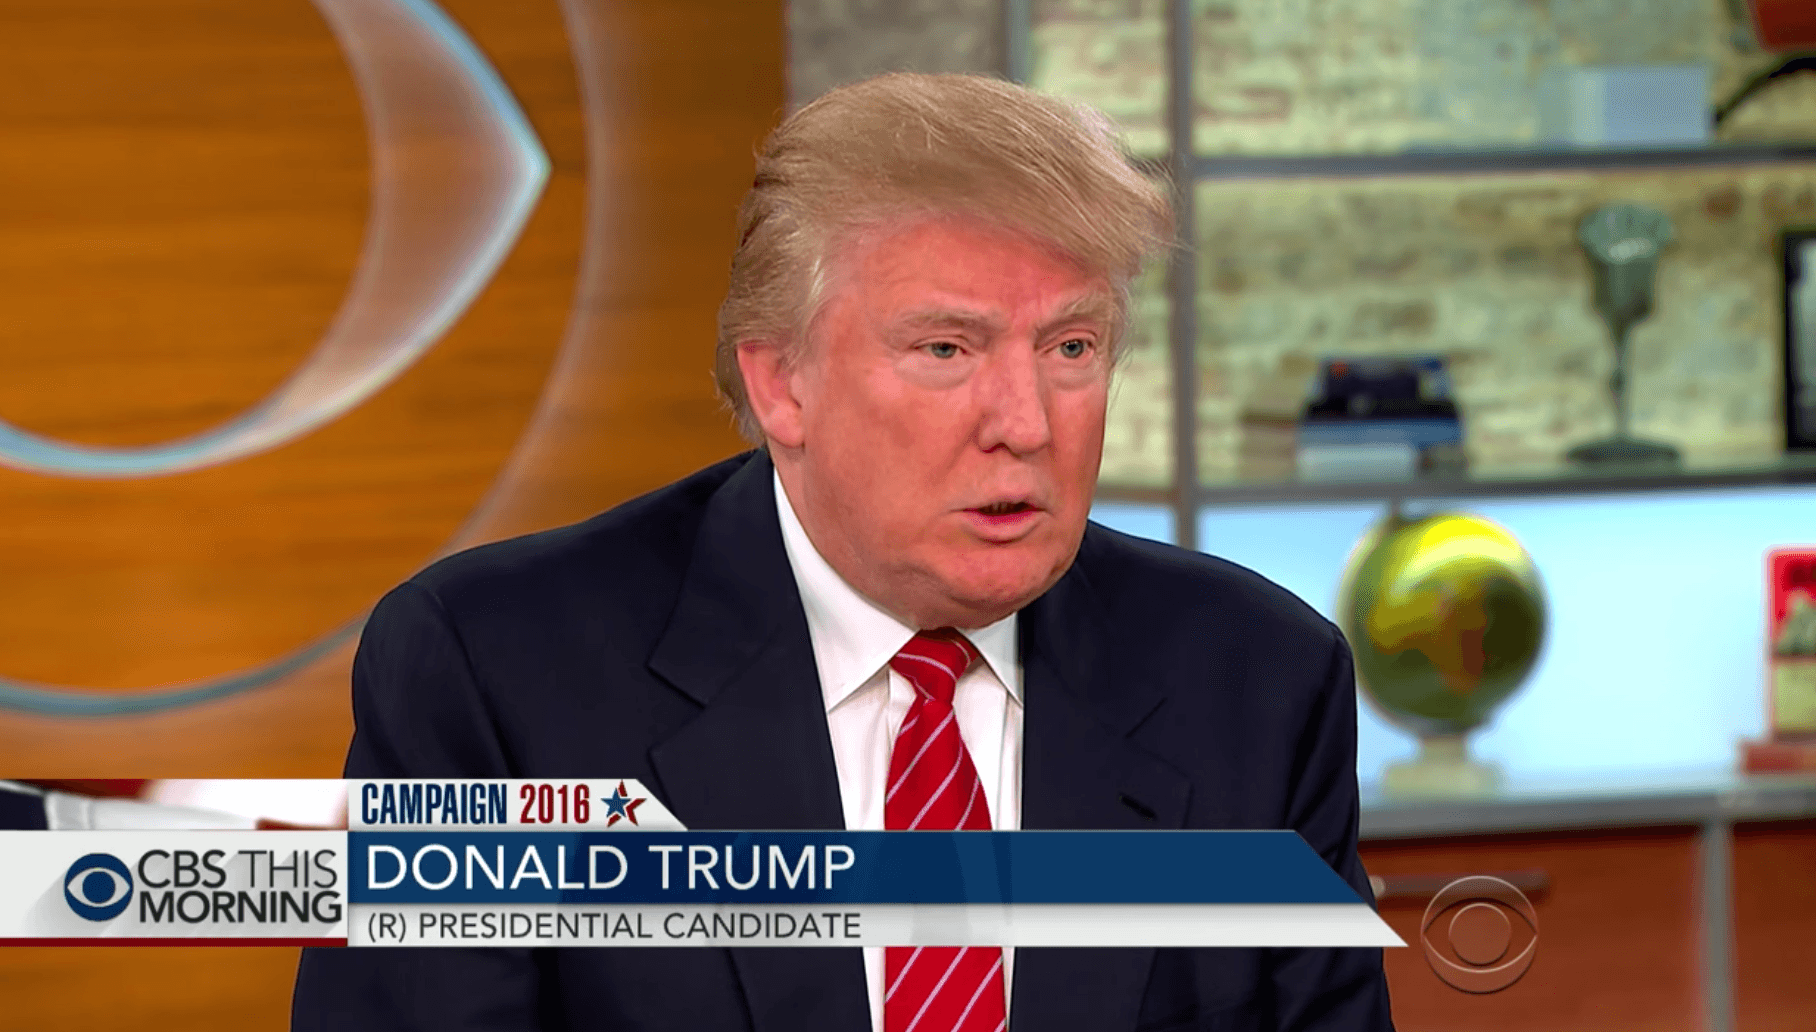 Trump on CBS This morning